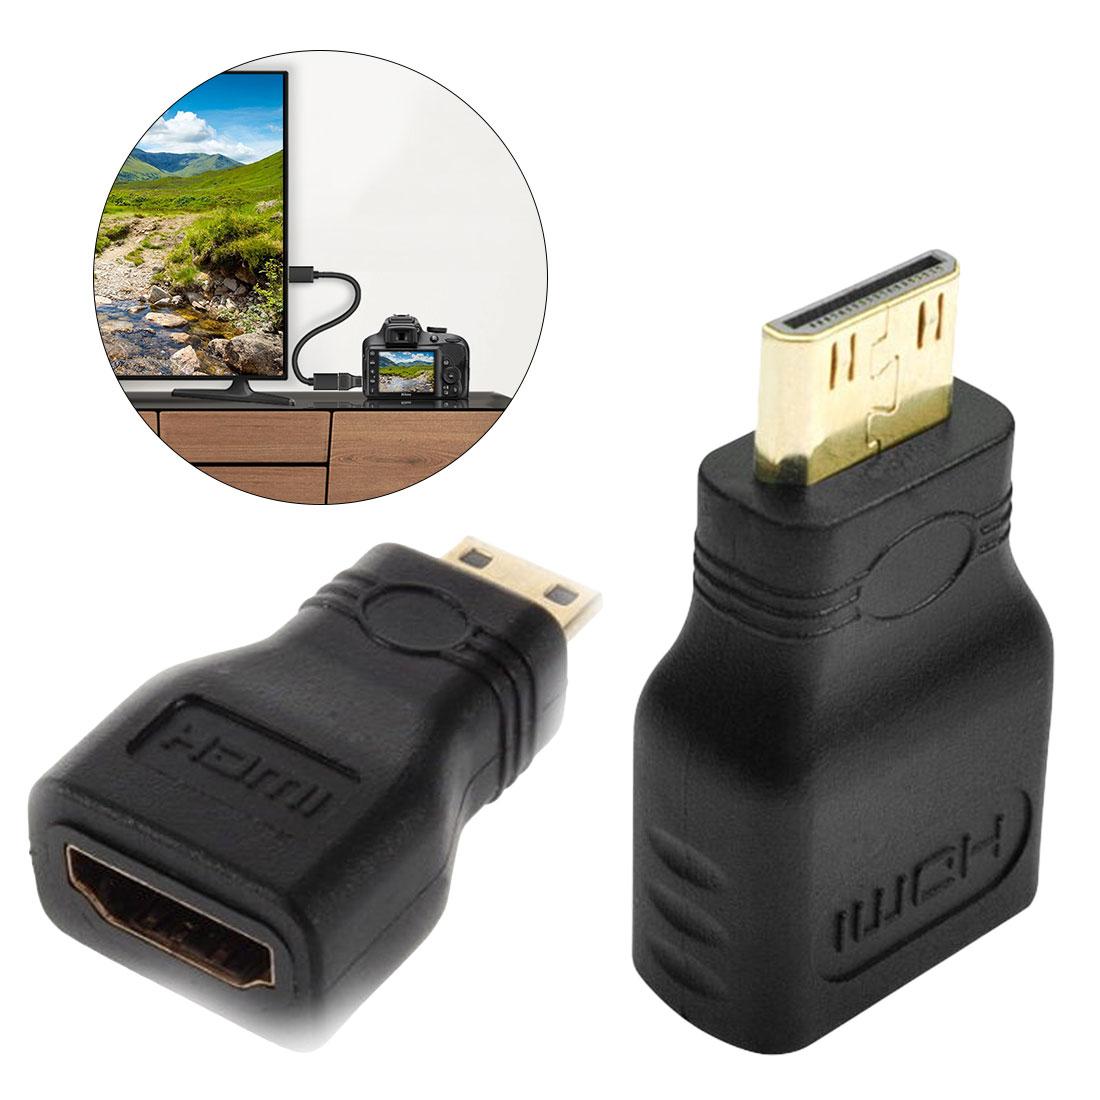 1PC HDMI Male Adapter Converter Type A Female to Type C Mini HDMI 1080p Full HD